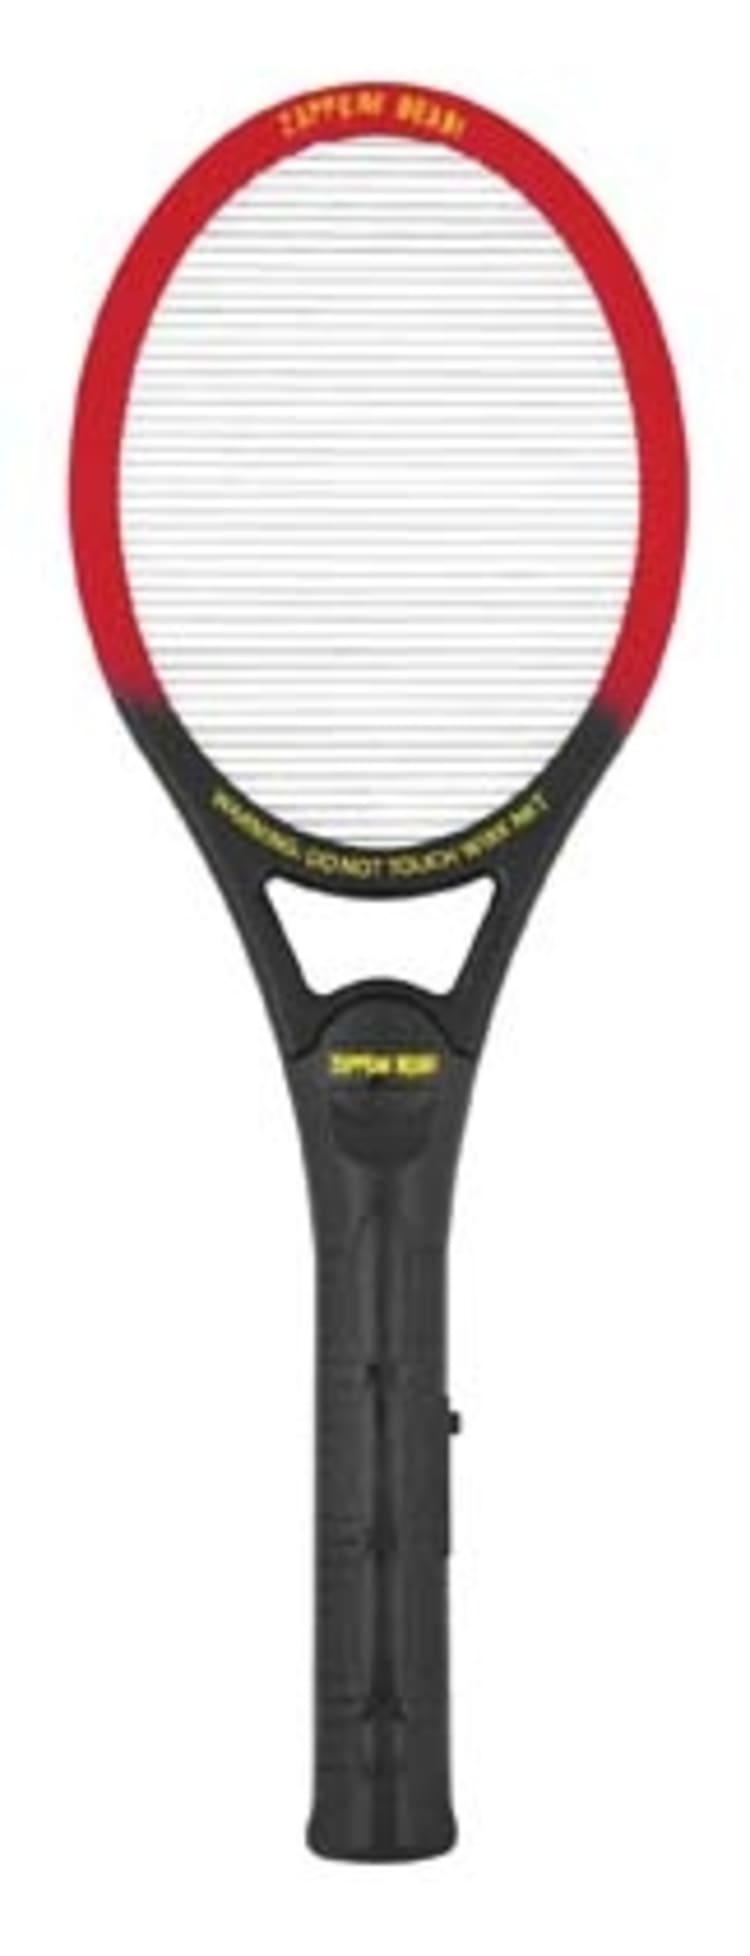 Electric Swatter - default